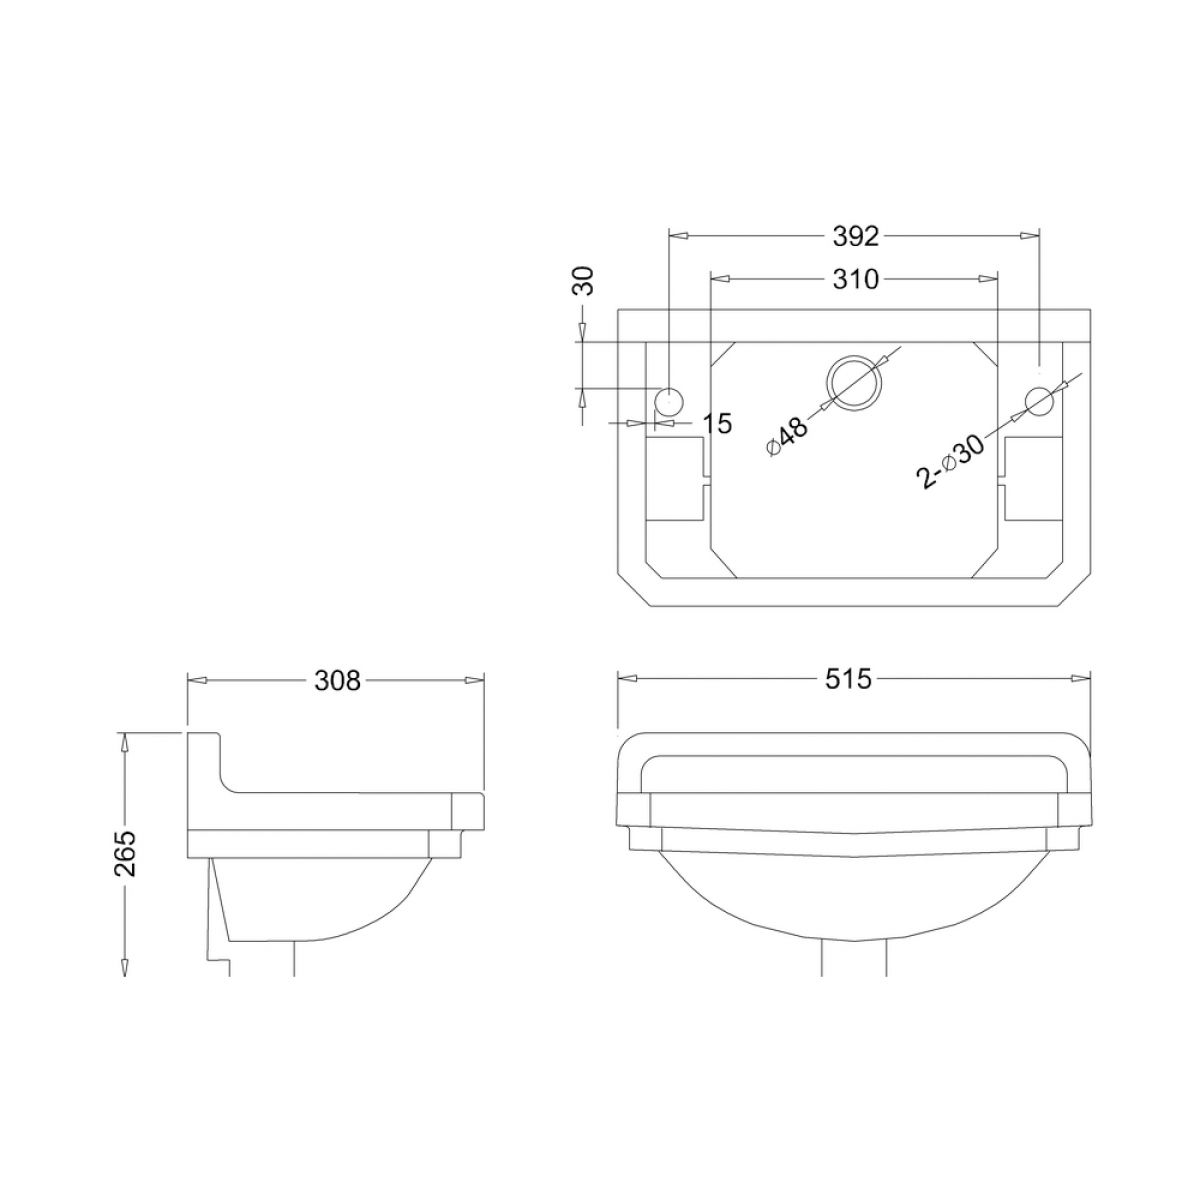 Burlington Jet Edwardian 2 Tap Hole Cloakroom Basin 515mm Dimensions